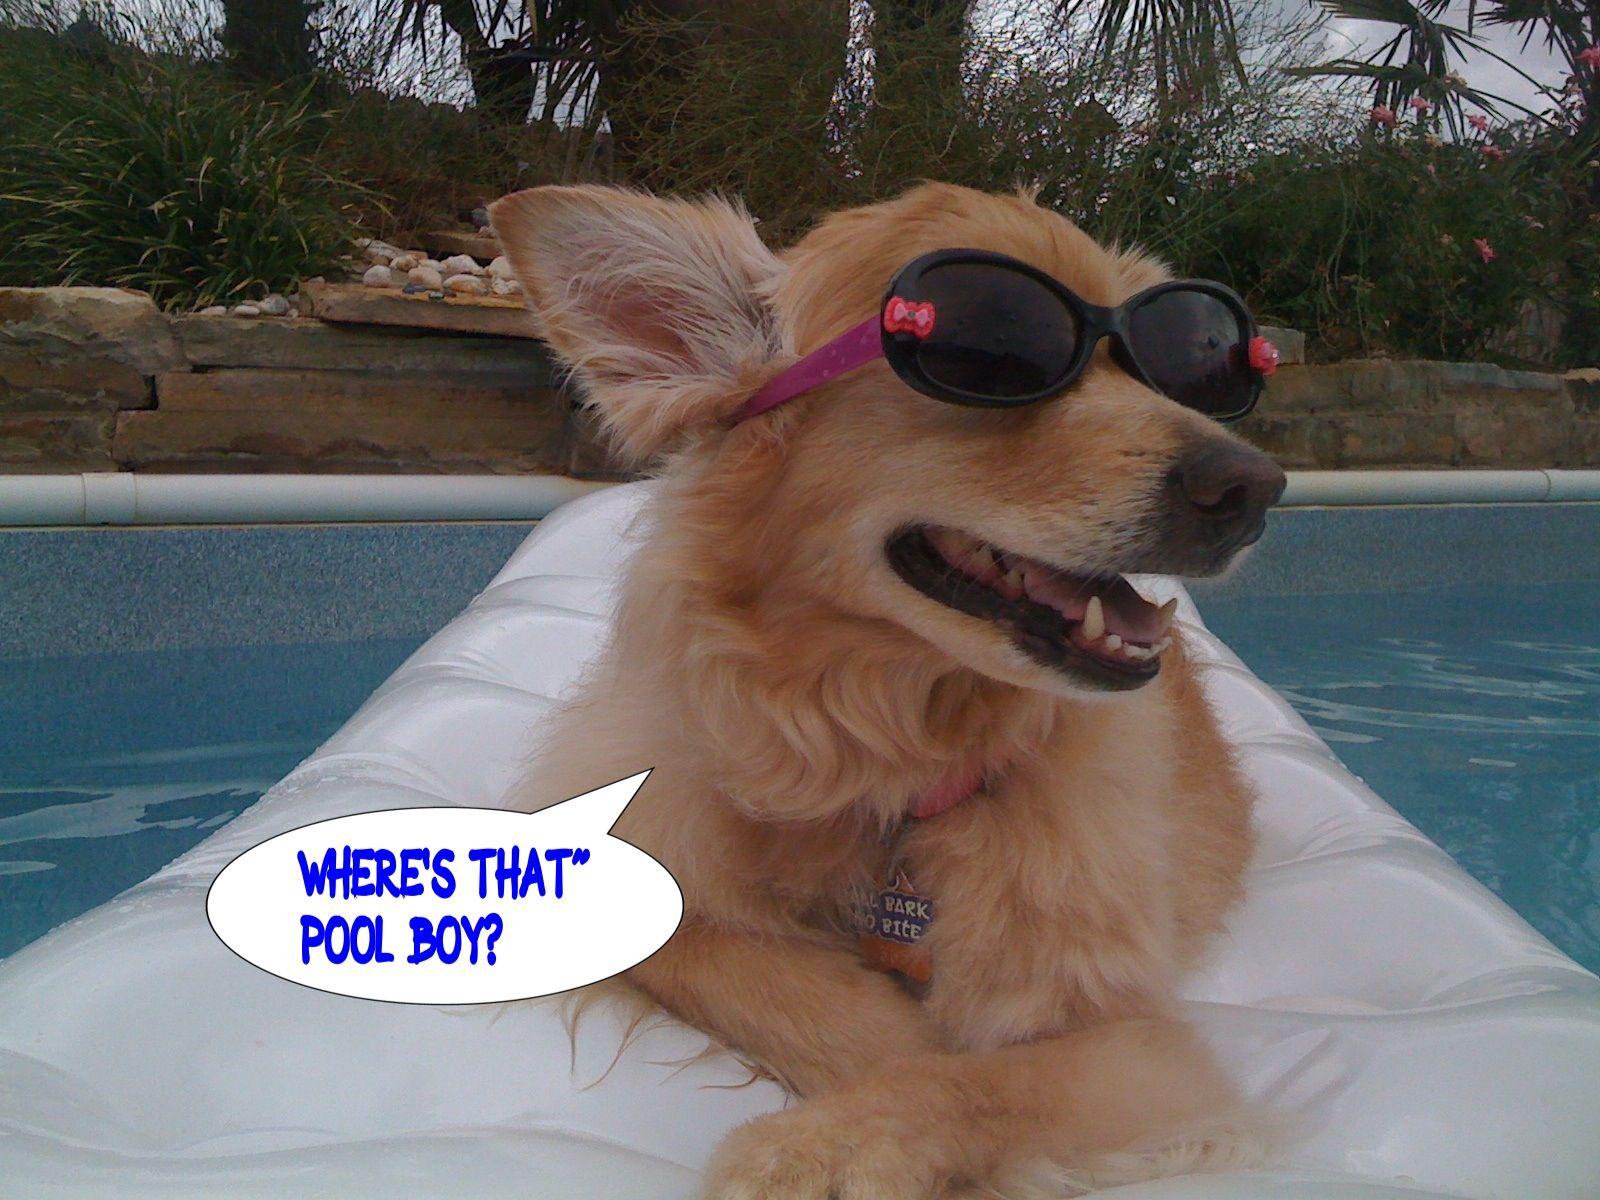 Wheres That Pool